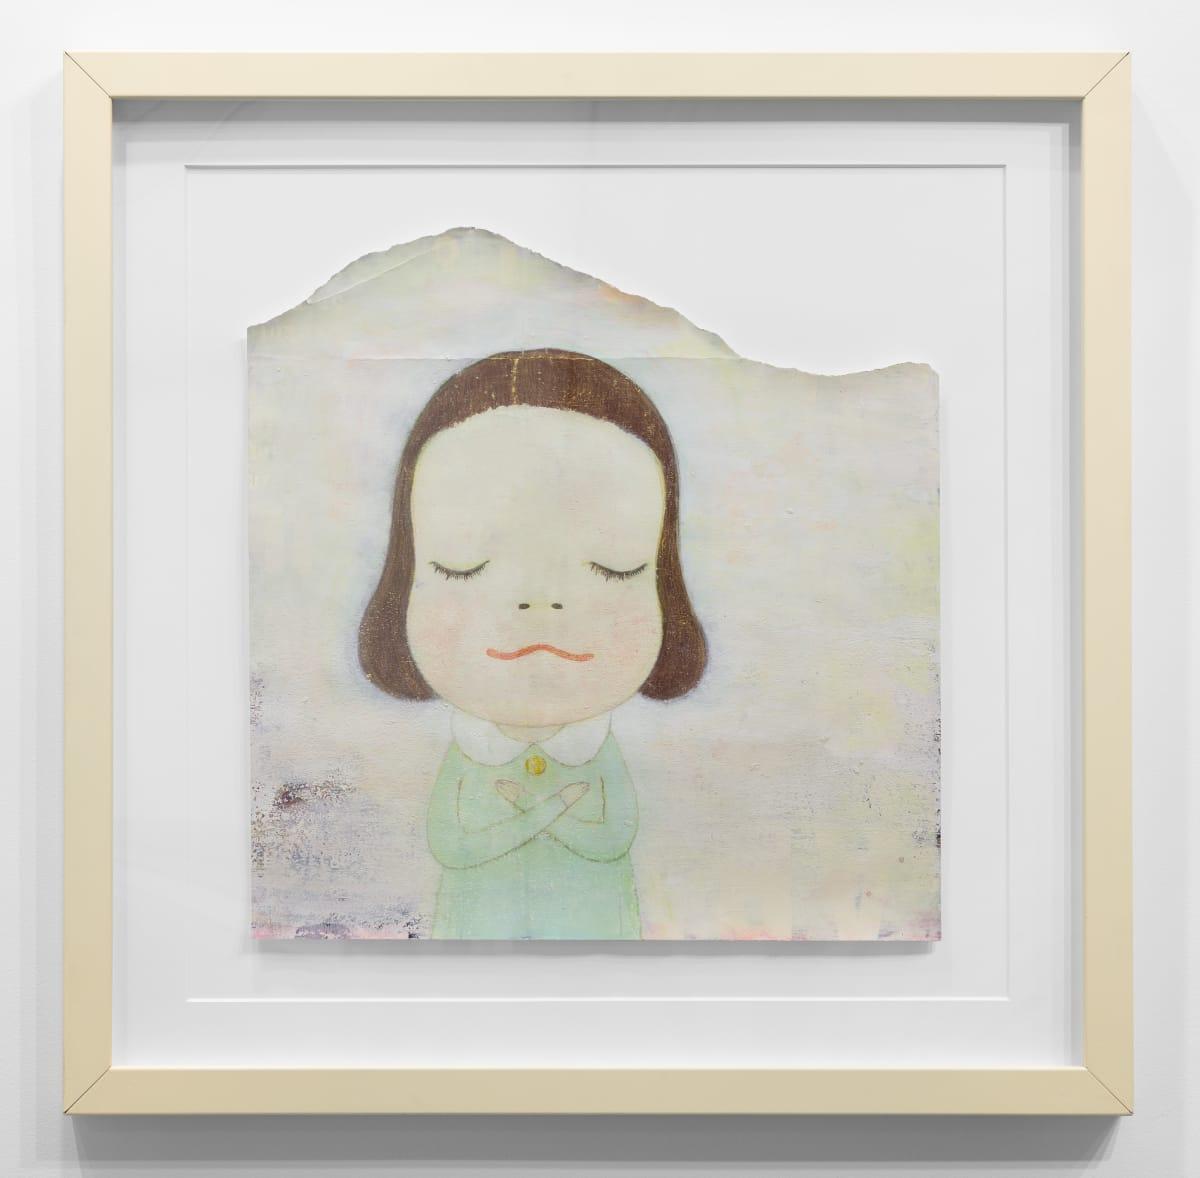 Yoshitomo Nara Untitled, 2000 Acrylic and color pencil on paper 17 1/2 x 16 7/8 in (44.5 x 42.9 cm) © YOSHITOMO NARA